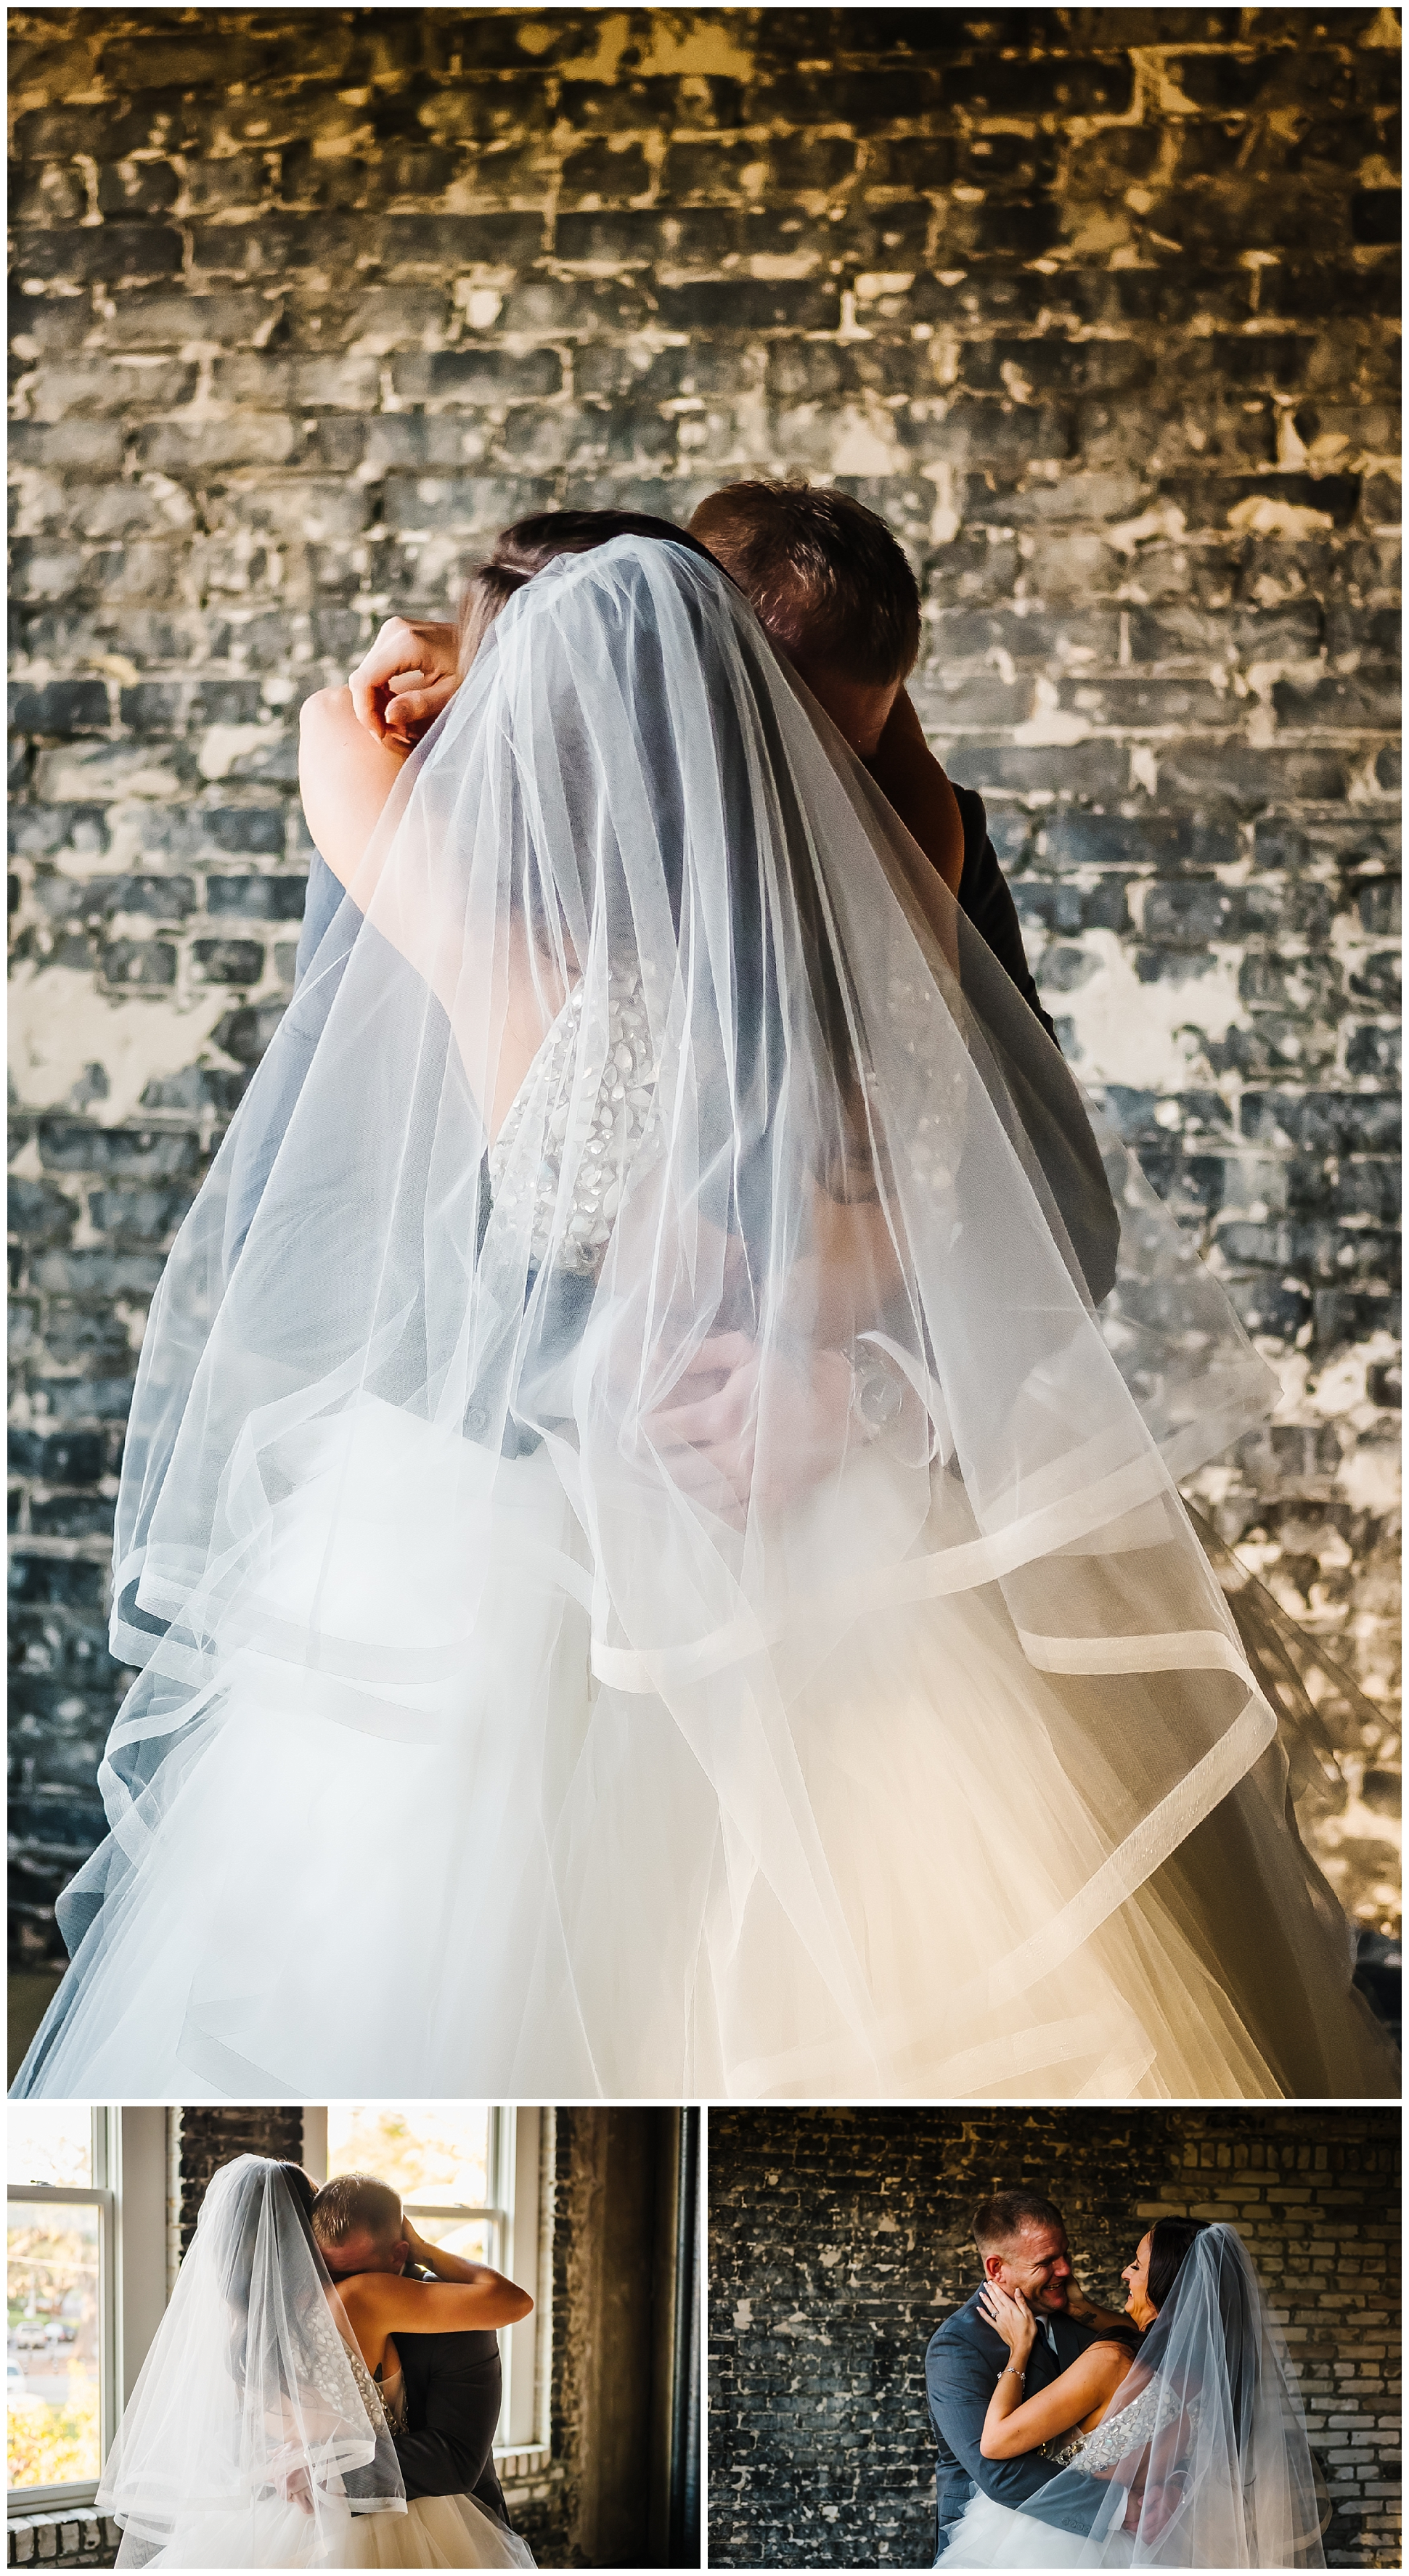 tampa-wedding-photographer-oxford-exchange-garland-candlelight-gold-hayley-paige_0024.jpg